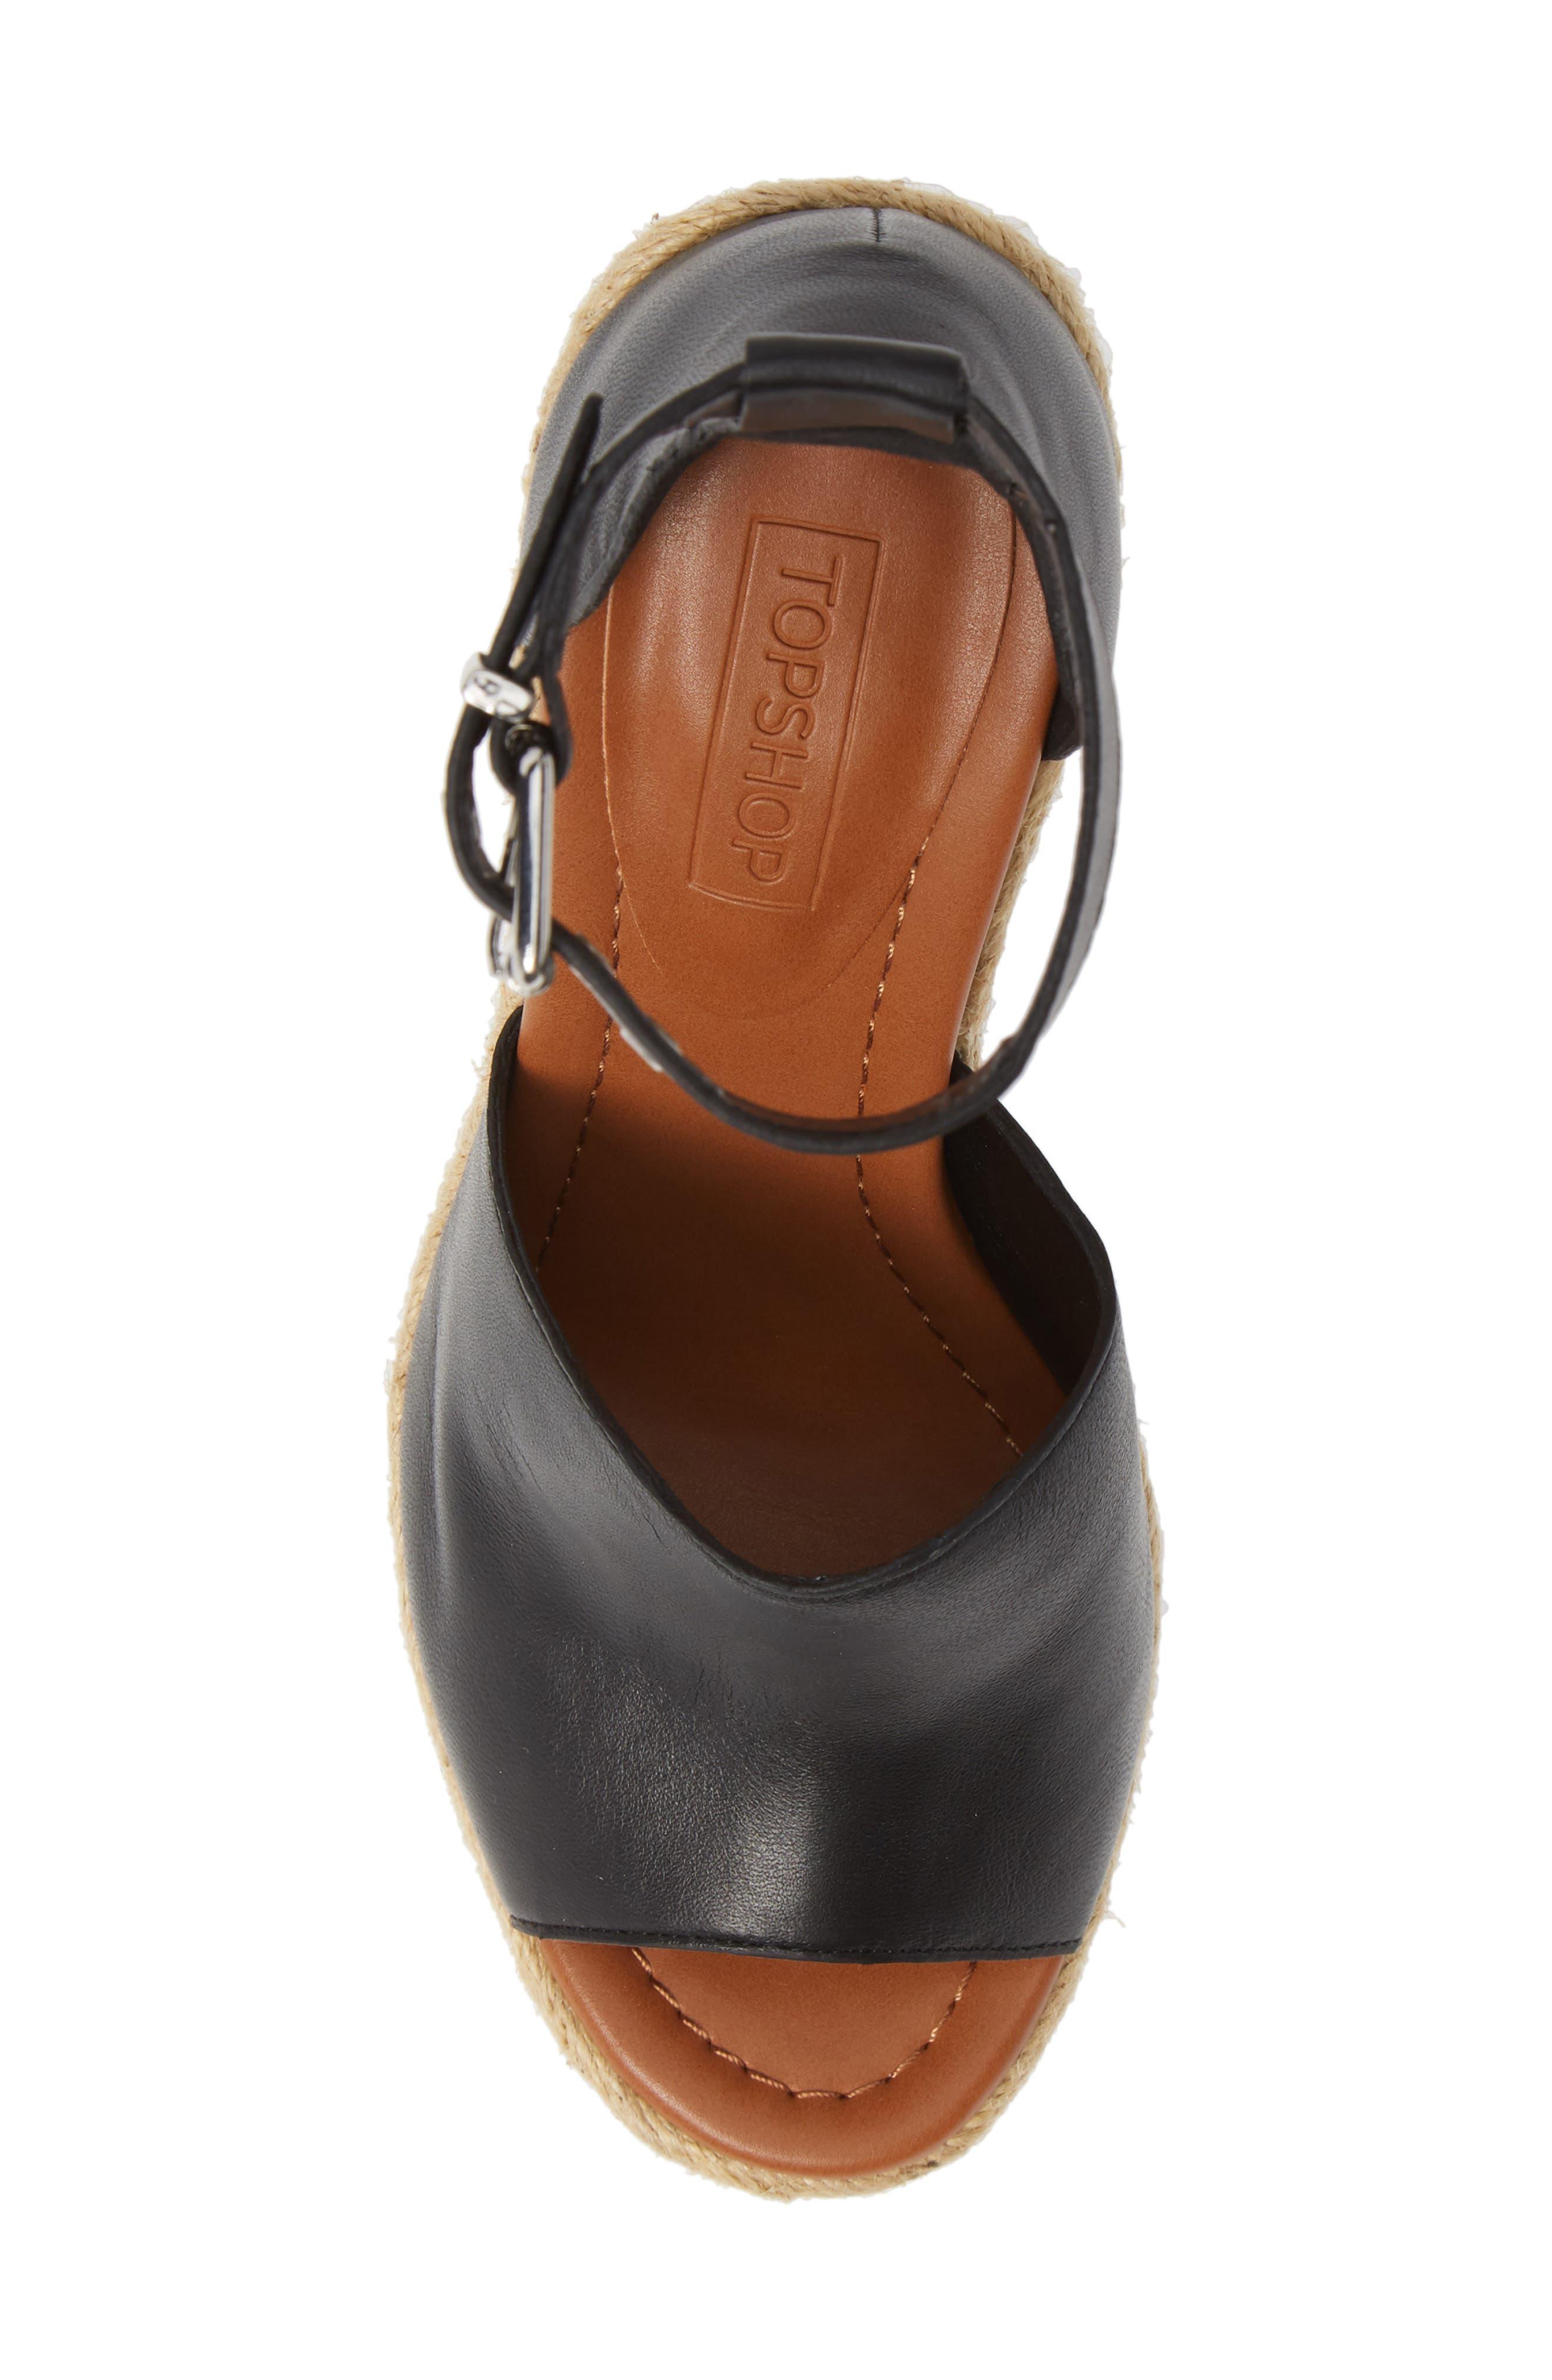 Wing Espadrille Wedge Sandal,                             Alternate thumbnail 4, color,                             Black